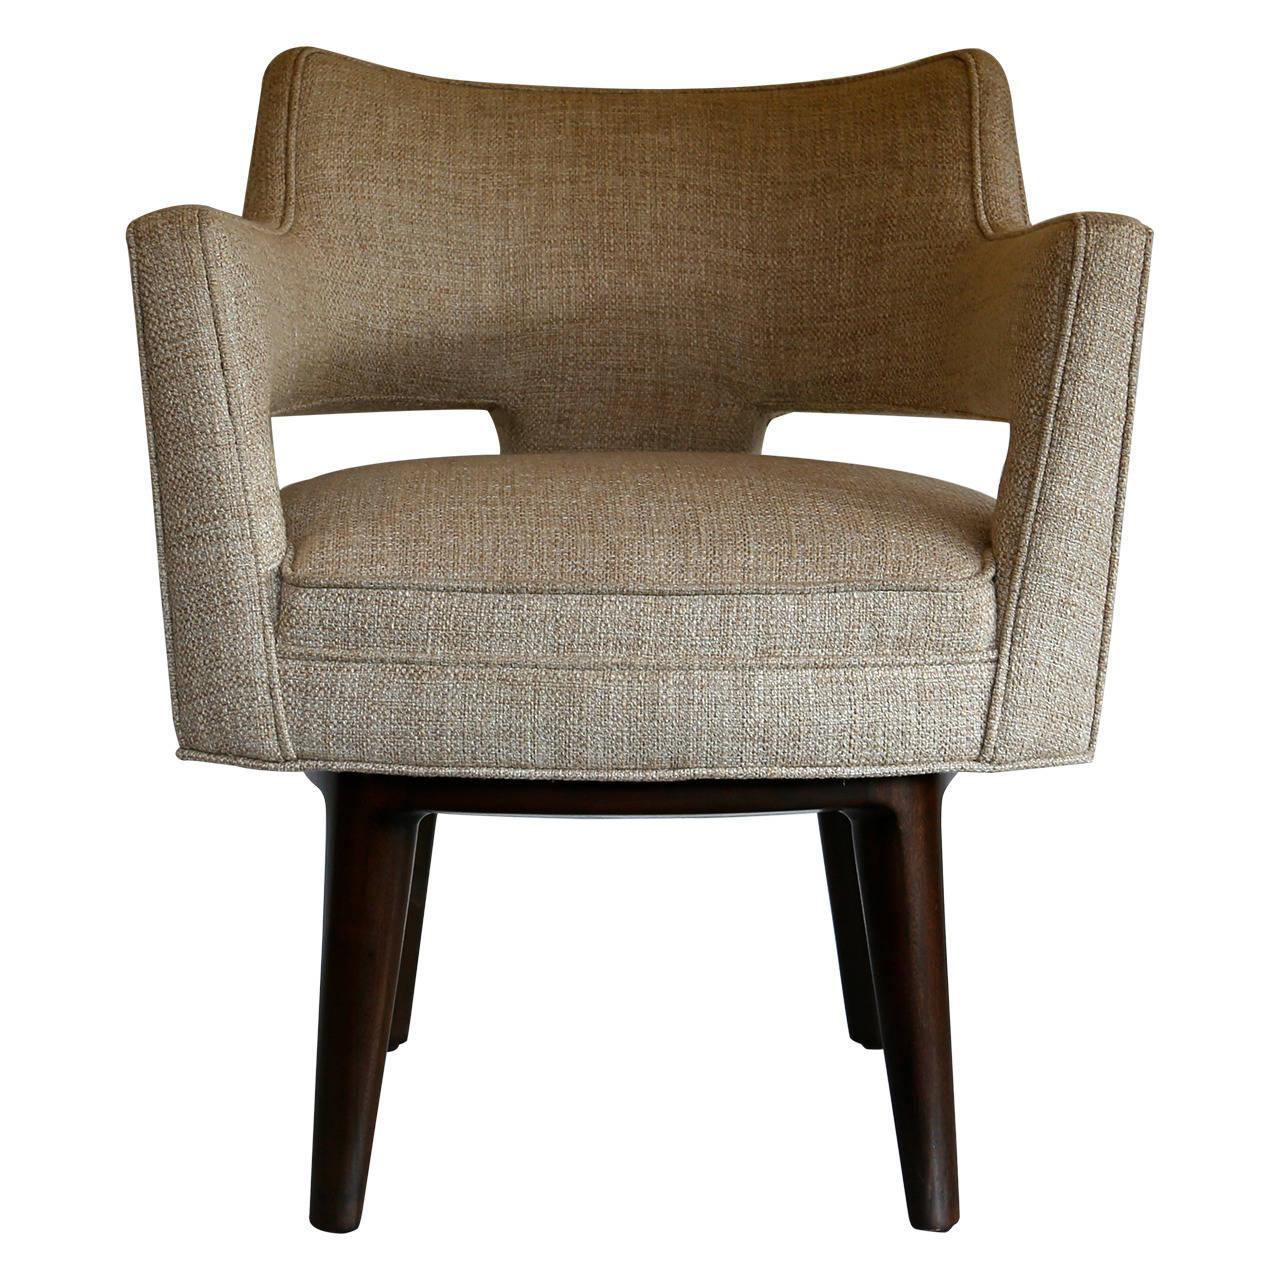 Swivel chair by edward wormley for dunbar at 1stdibs - Edward wormley chairs ...